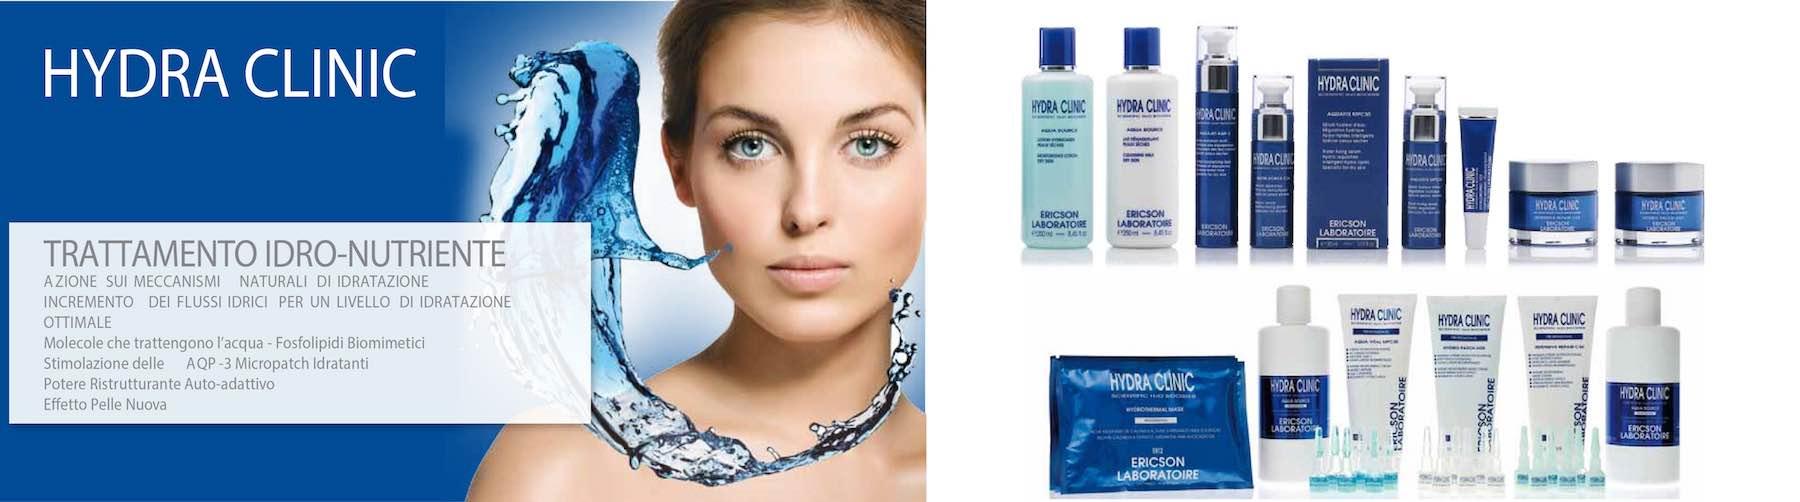 Jerà Beauty - Face-Ericson-Laboratoire-hydra clinic